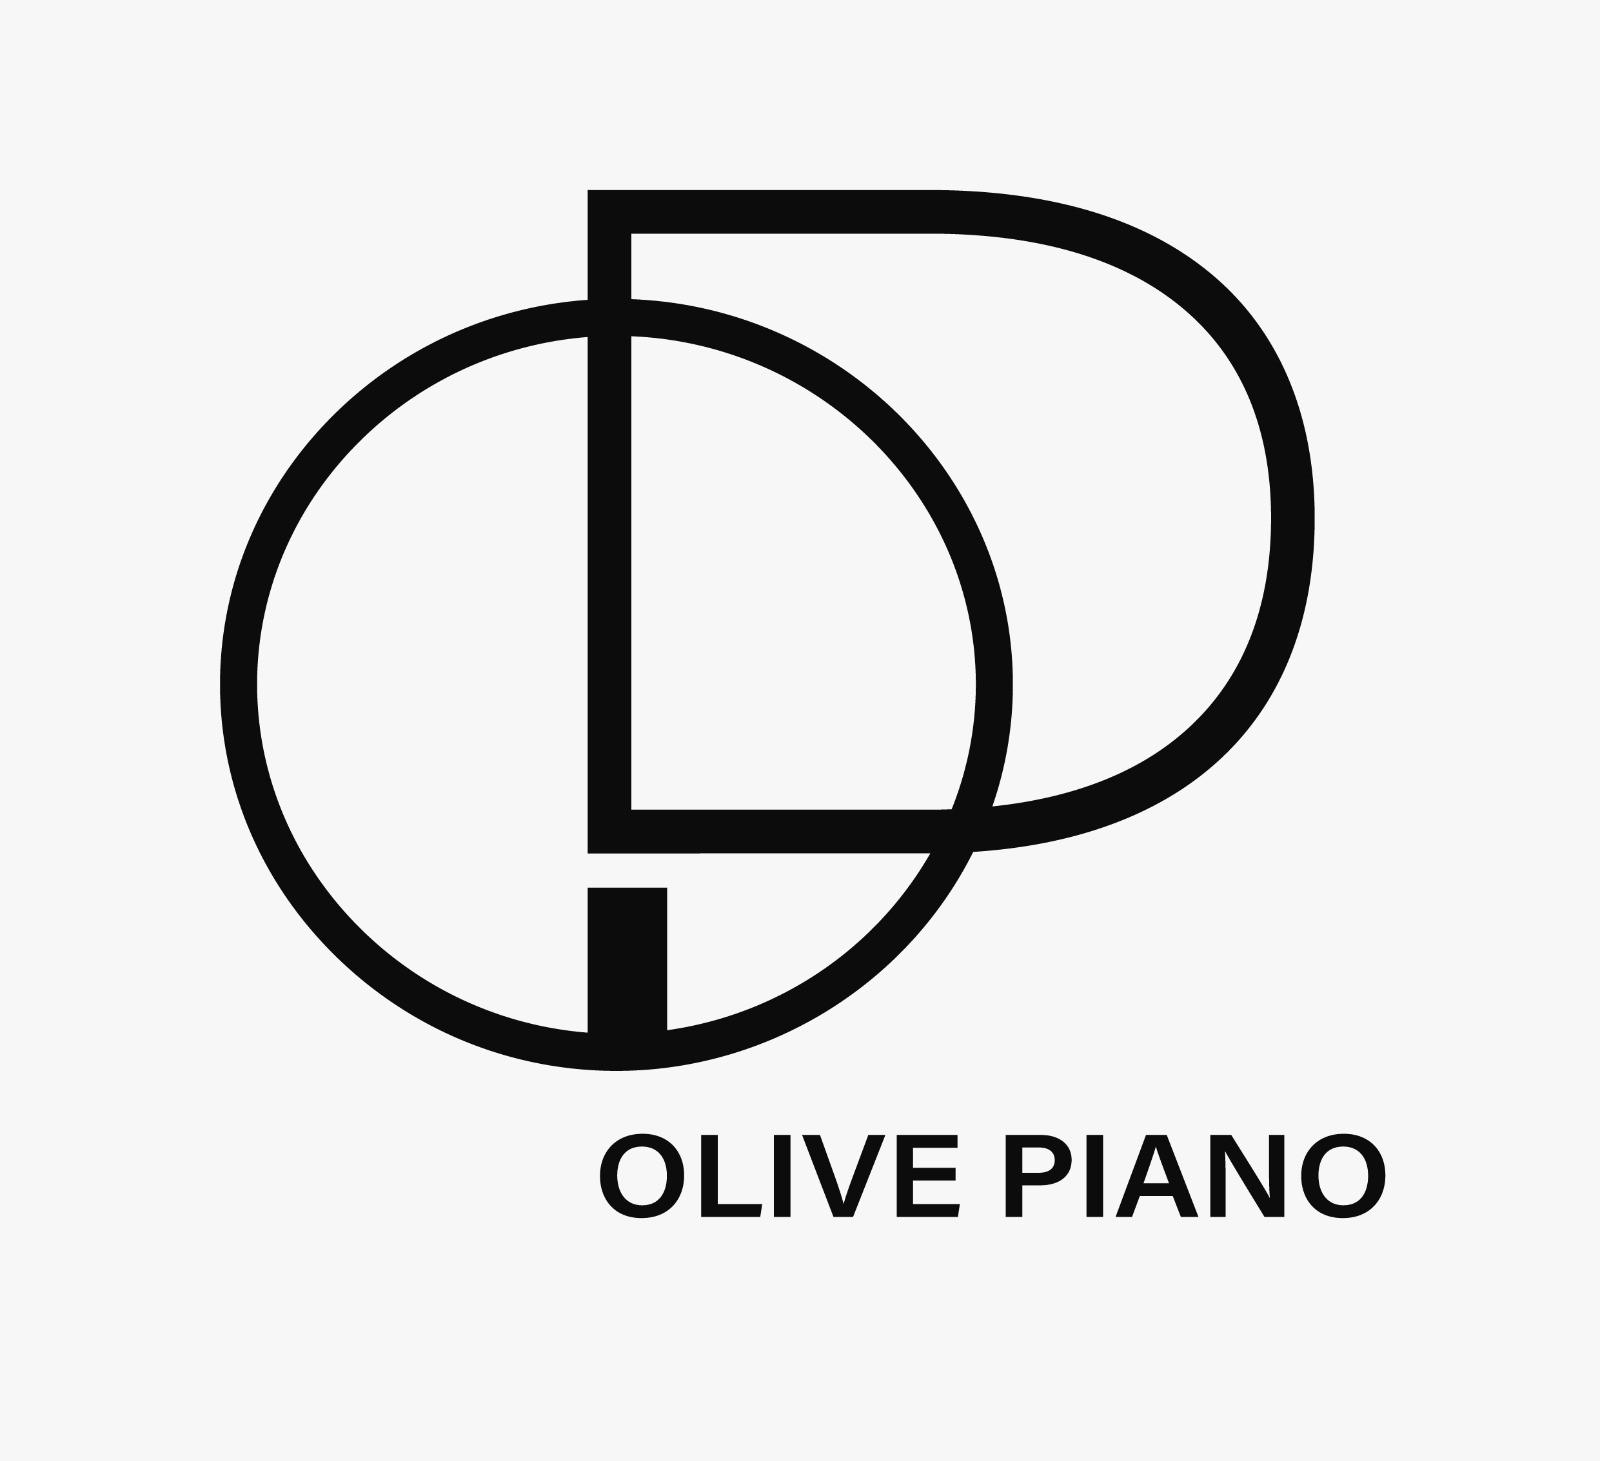 OLIVE PIANO